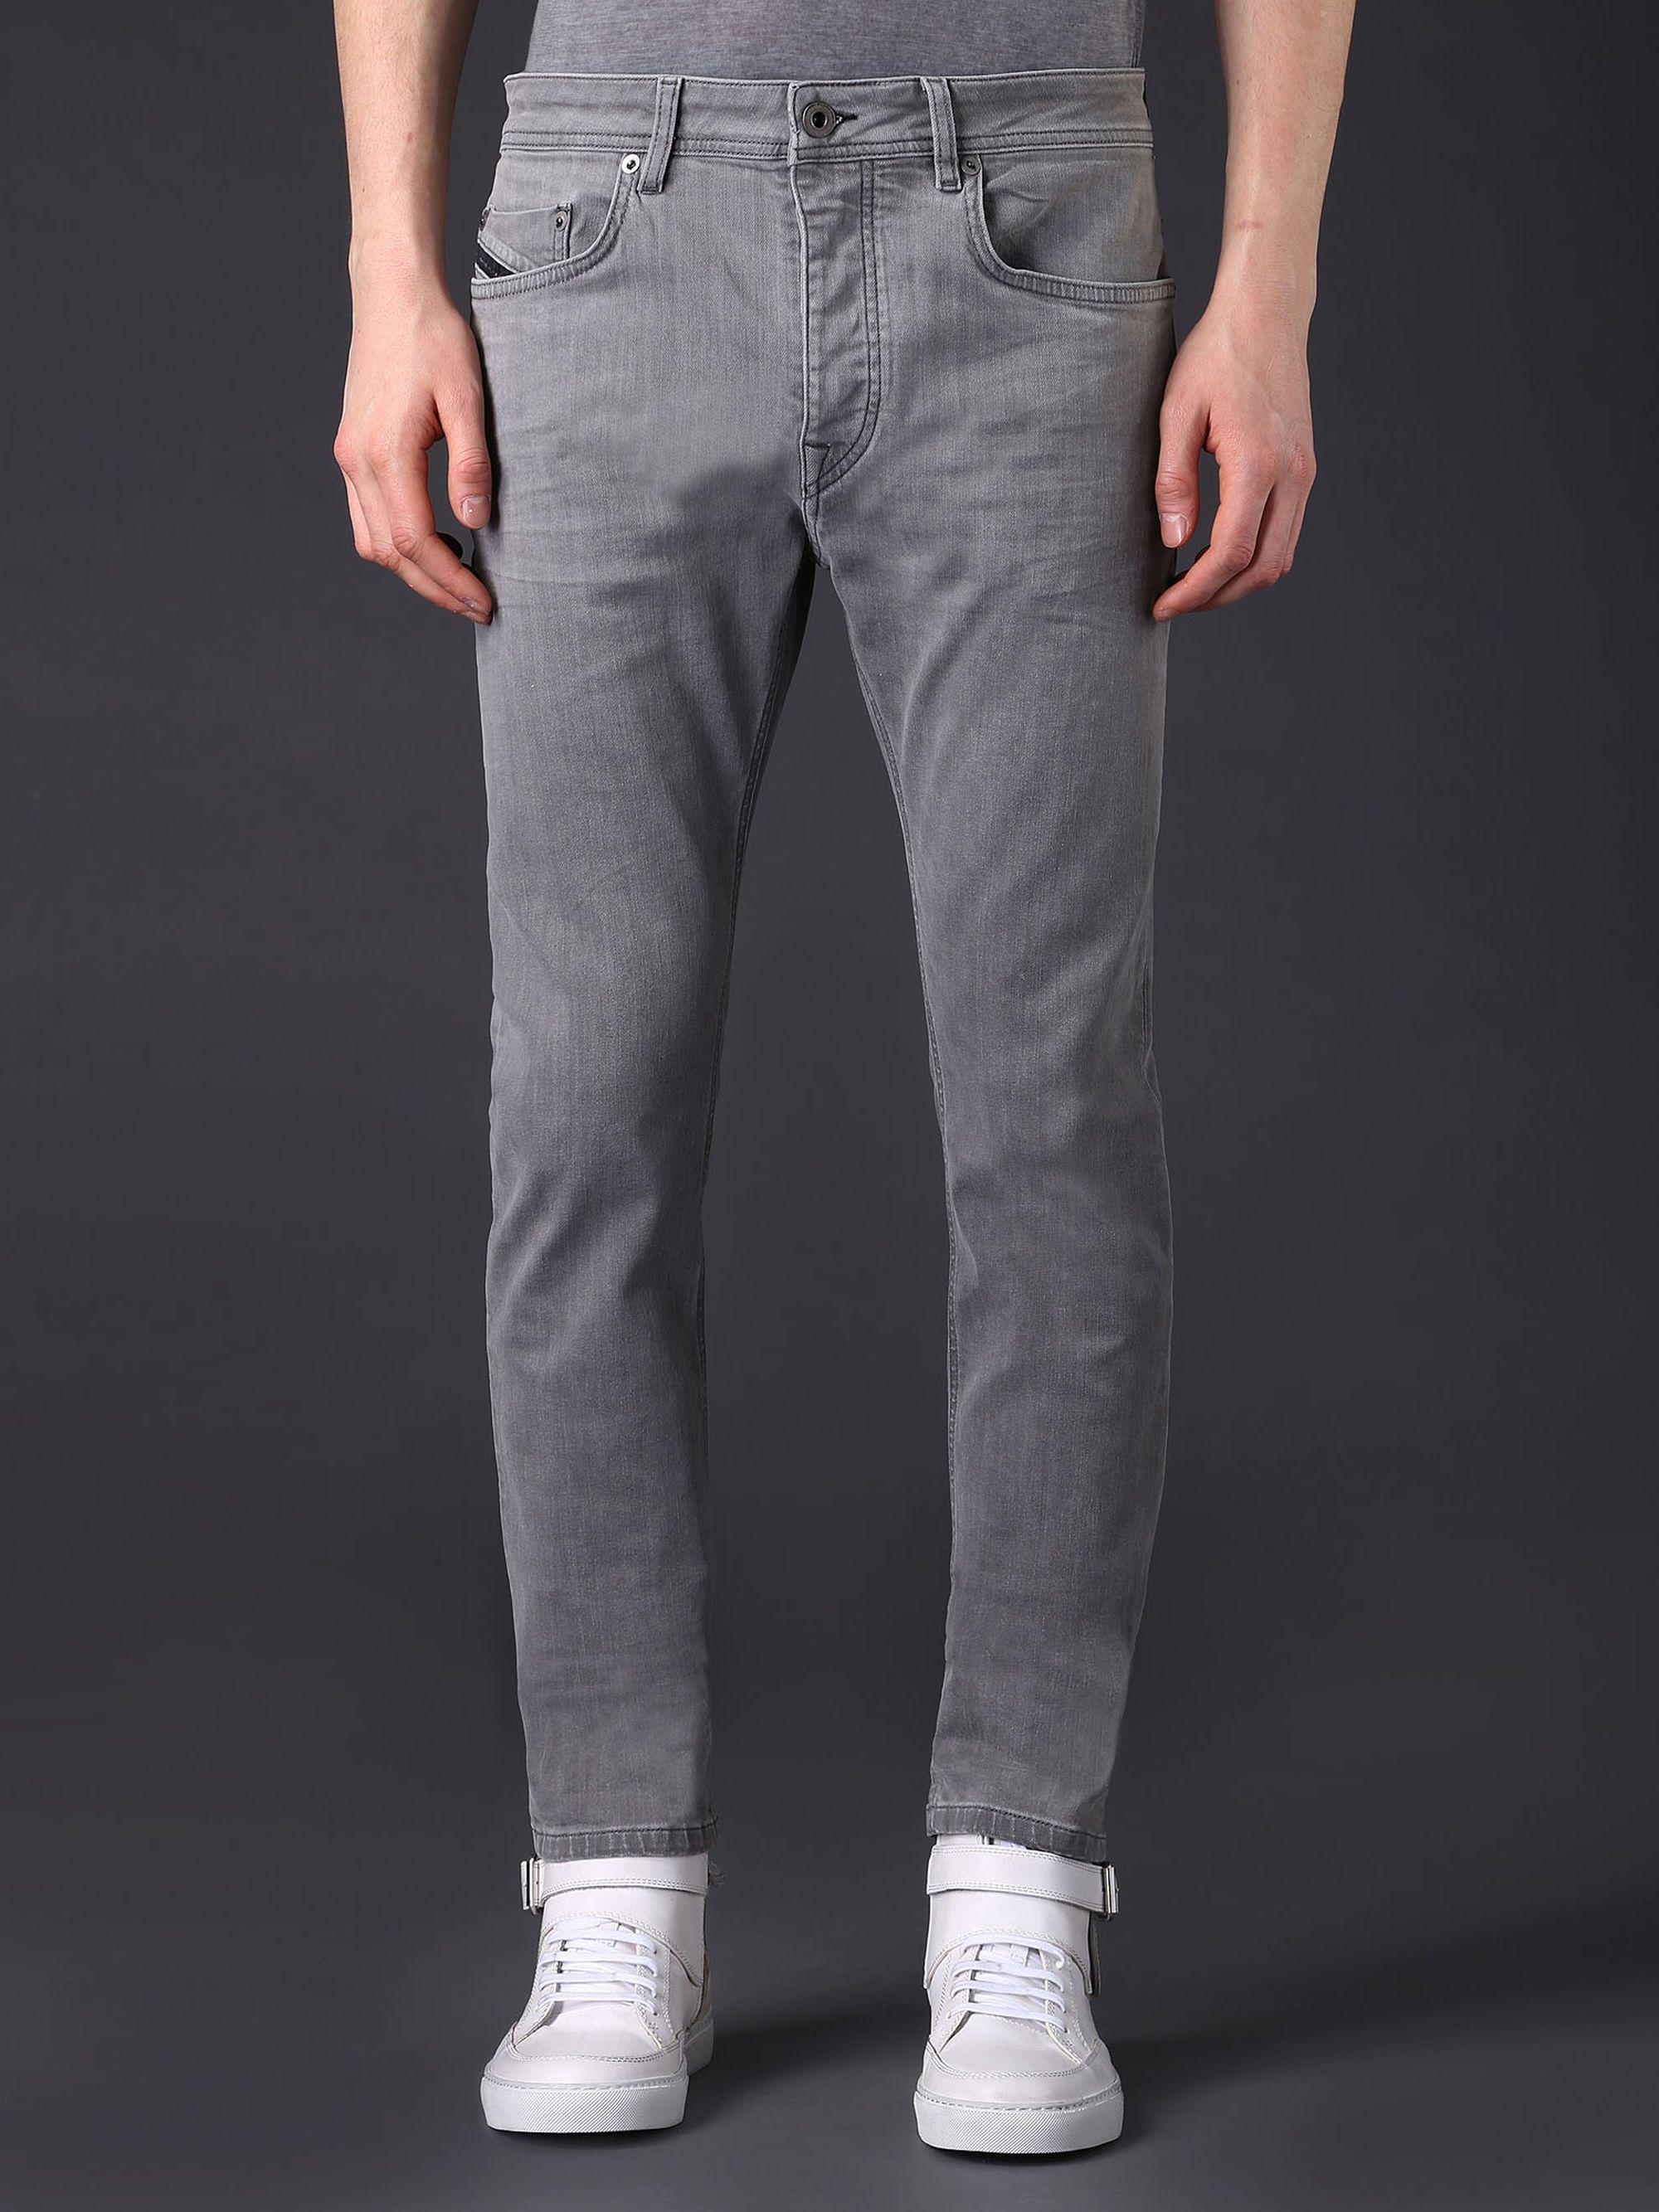 45f318b8 Diesel Black Gold TYPE-2512 Stretch Denim Jeans in Grey Jeans from the Diesel  Online Store #DieselBlackGold #TYPE2512 #DieselOnlineStore